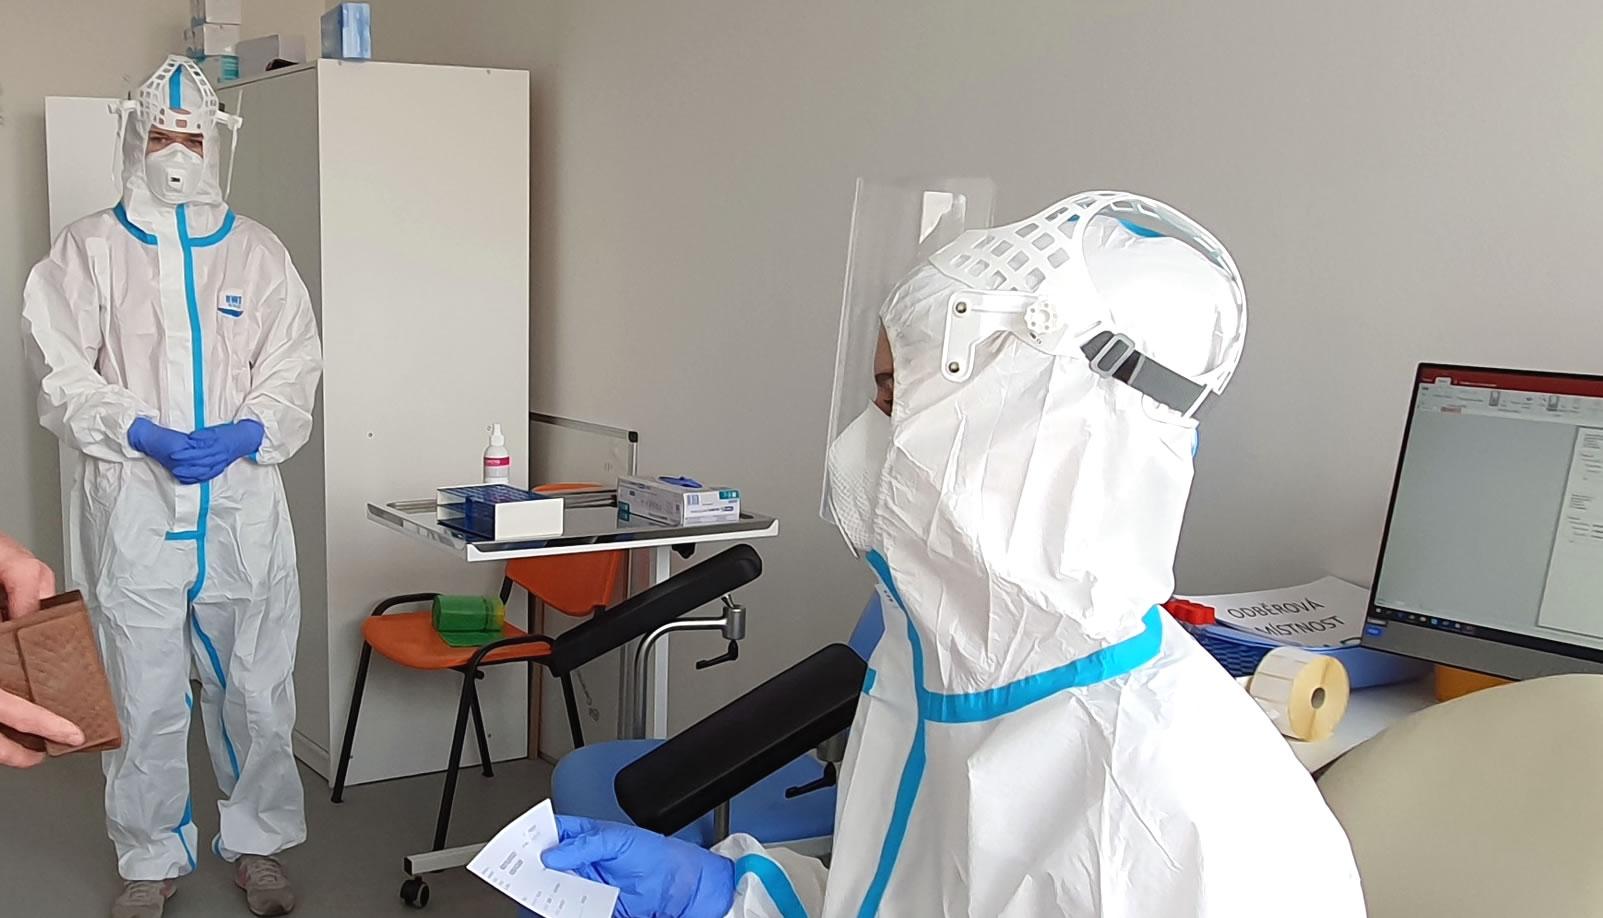 Obrázek na adrese https://www.spadia.cz/media/1763/test-koronavirus-covid-brno-pro-samoplatce.jpg